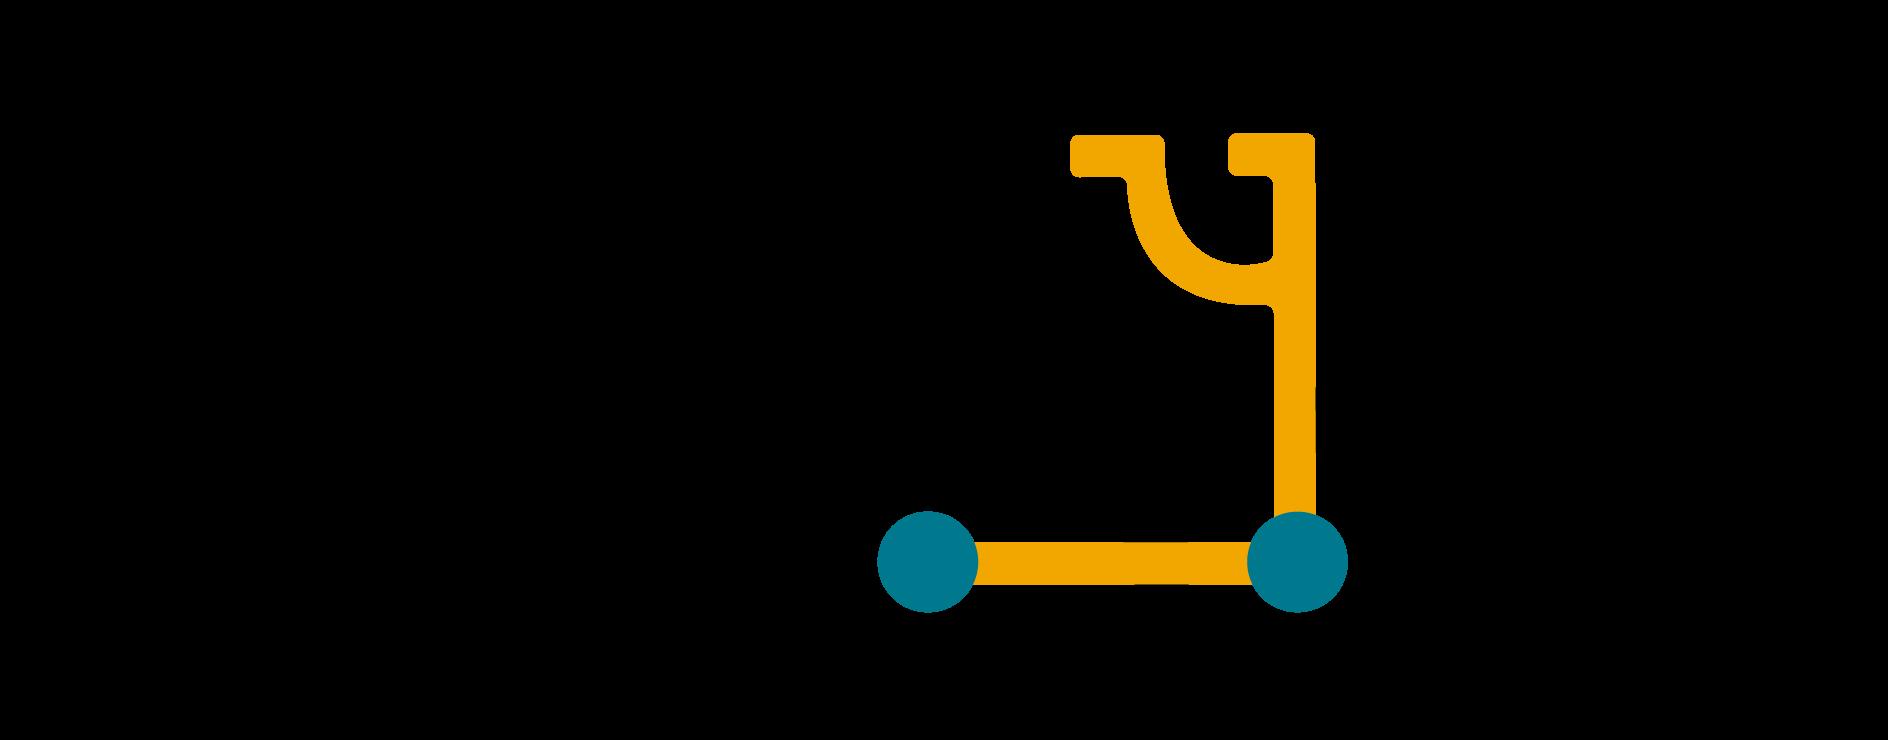 re-cycle macon logo.png